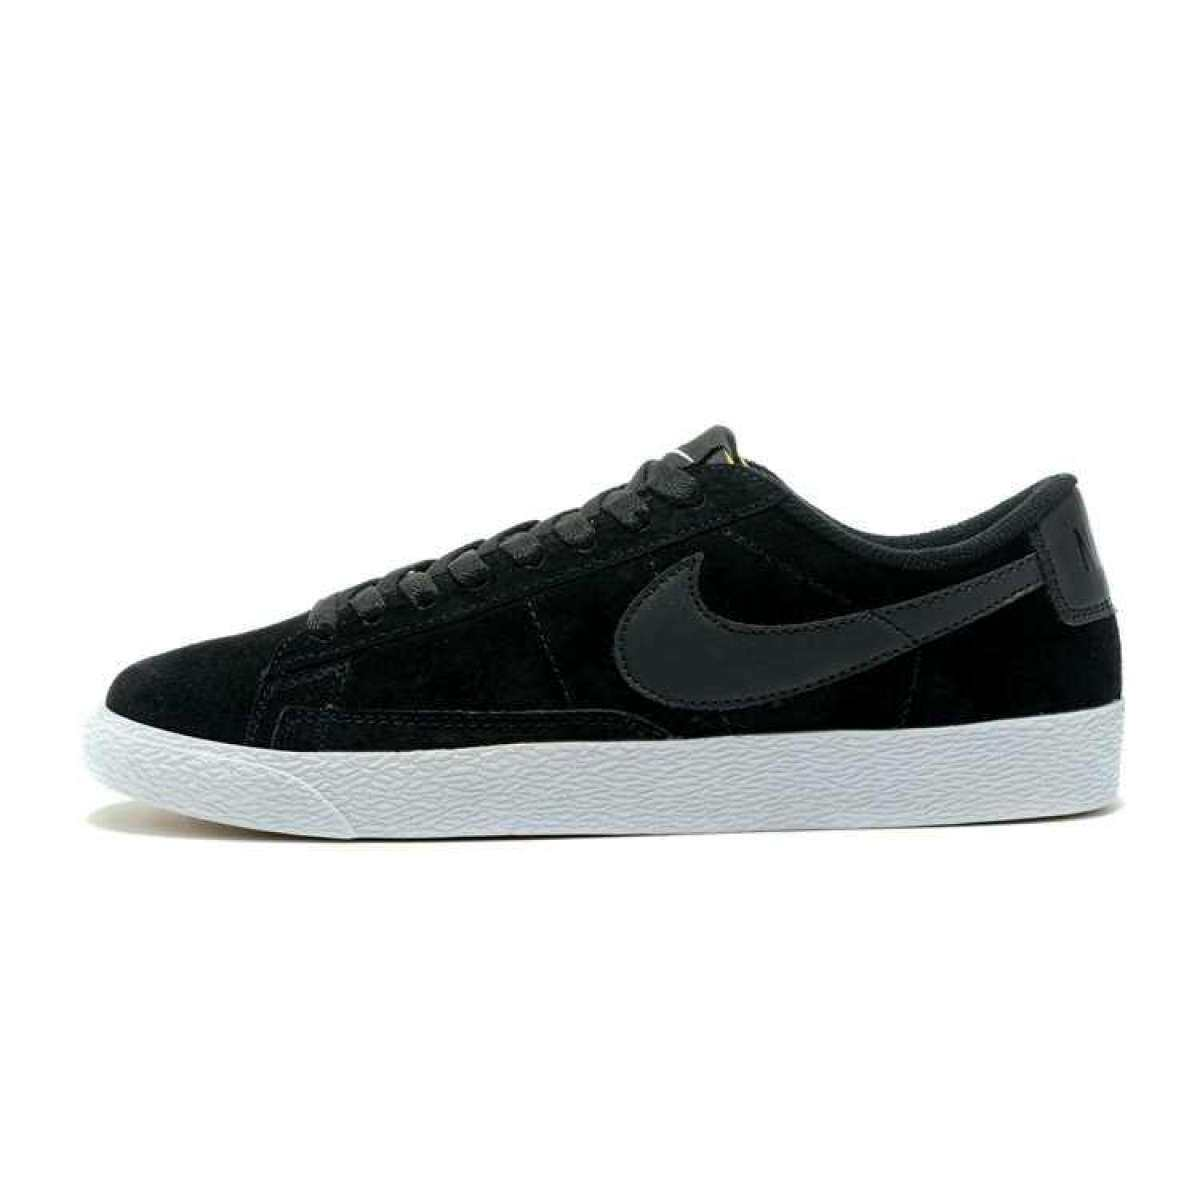 273a145bf09abb Original Top Quality Classic Men s and Women s Blazer Low Prm Vntg Premium  Suede Fashion Nike Skateboarding Shoe